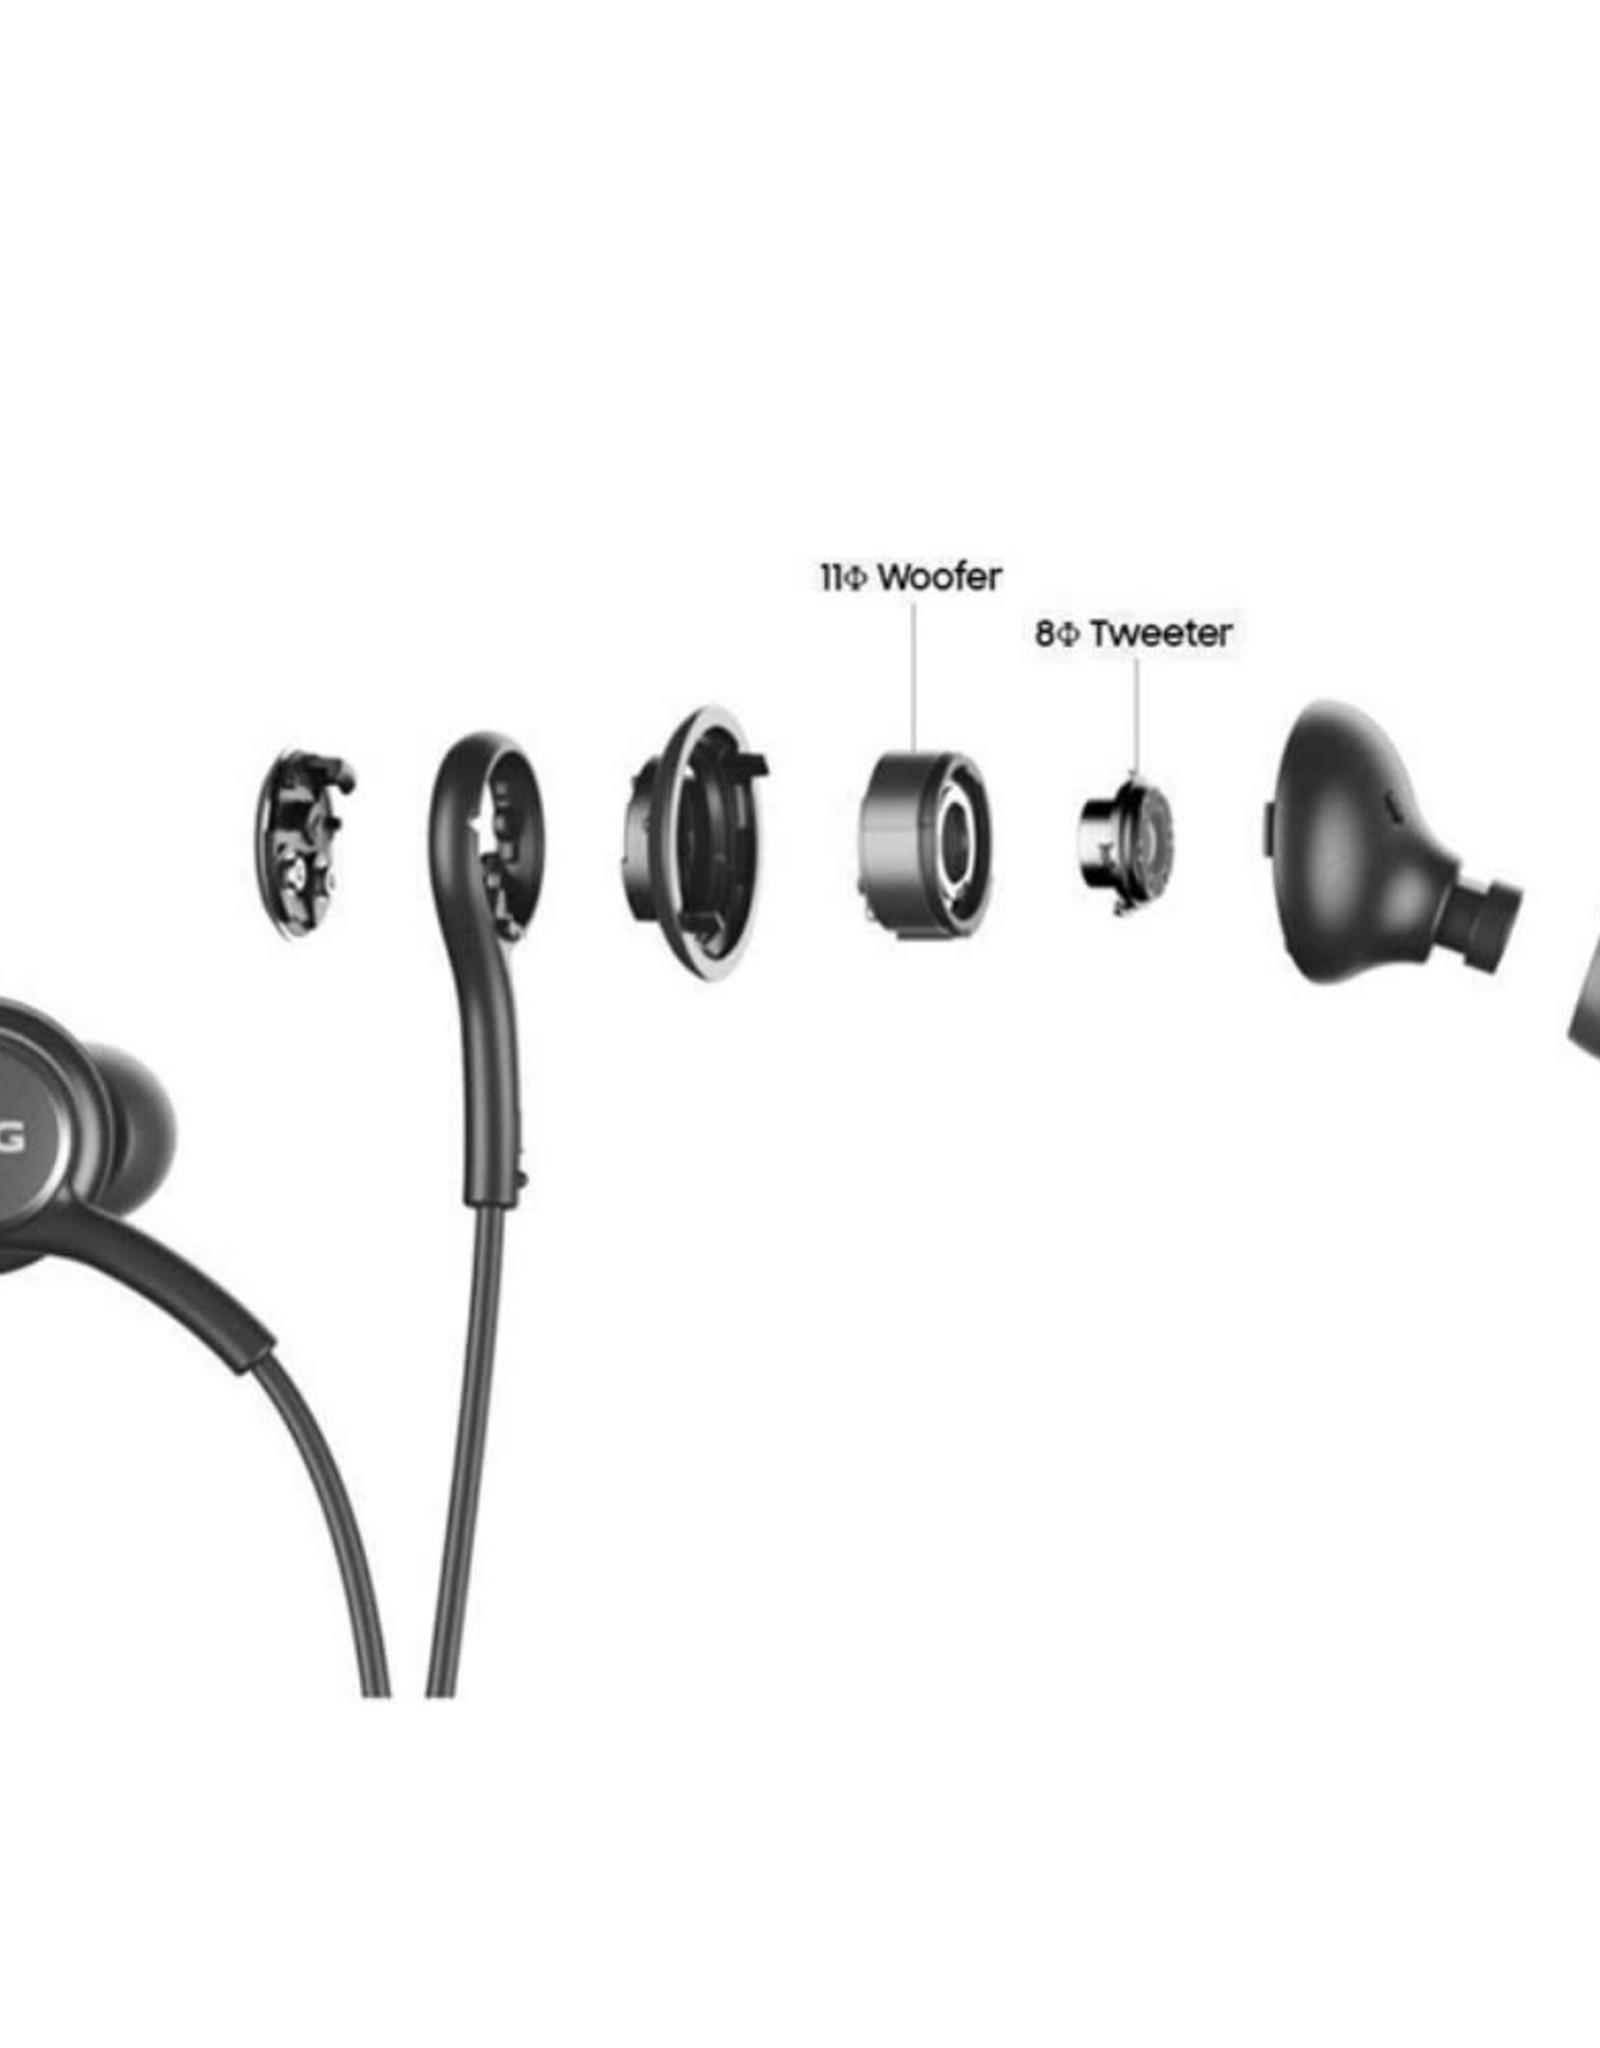 Akg Eo Ig955 Stereo Handsfree Earphone Headphone With Mic